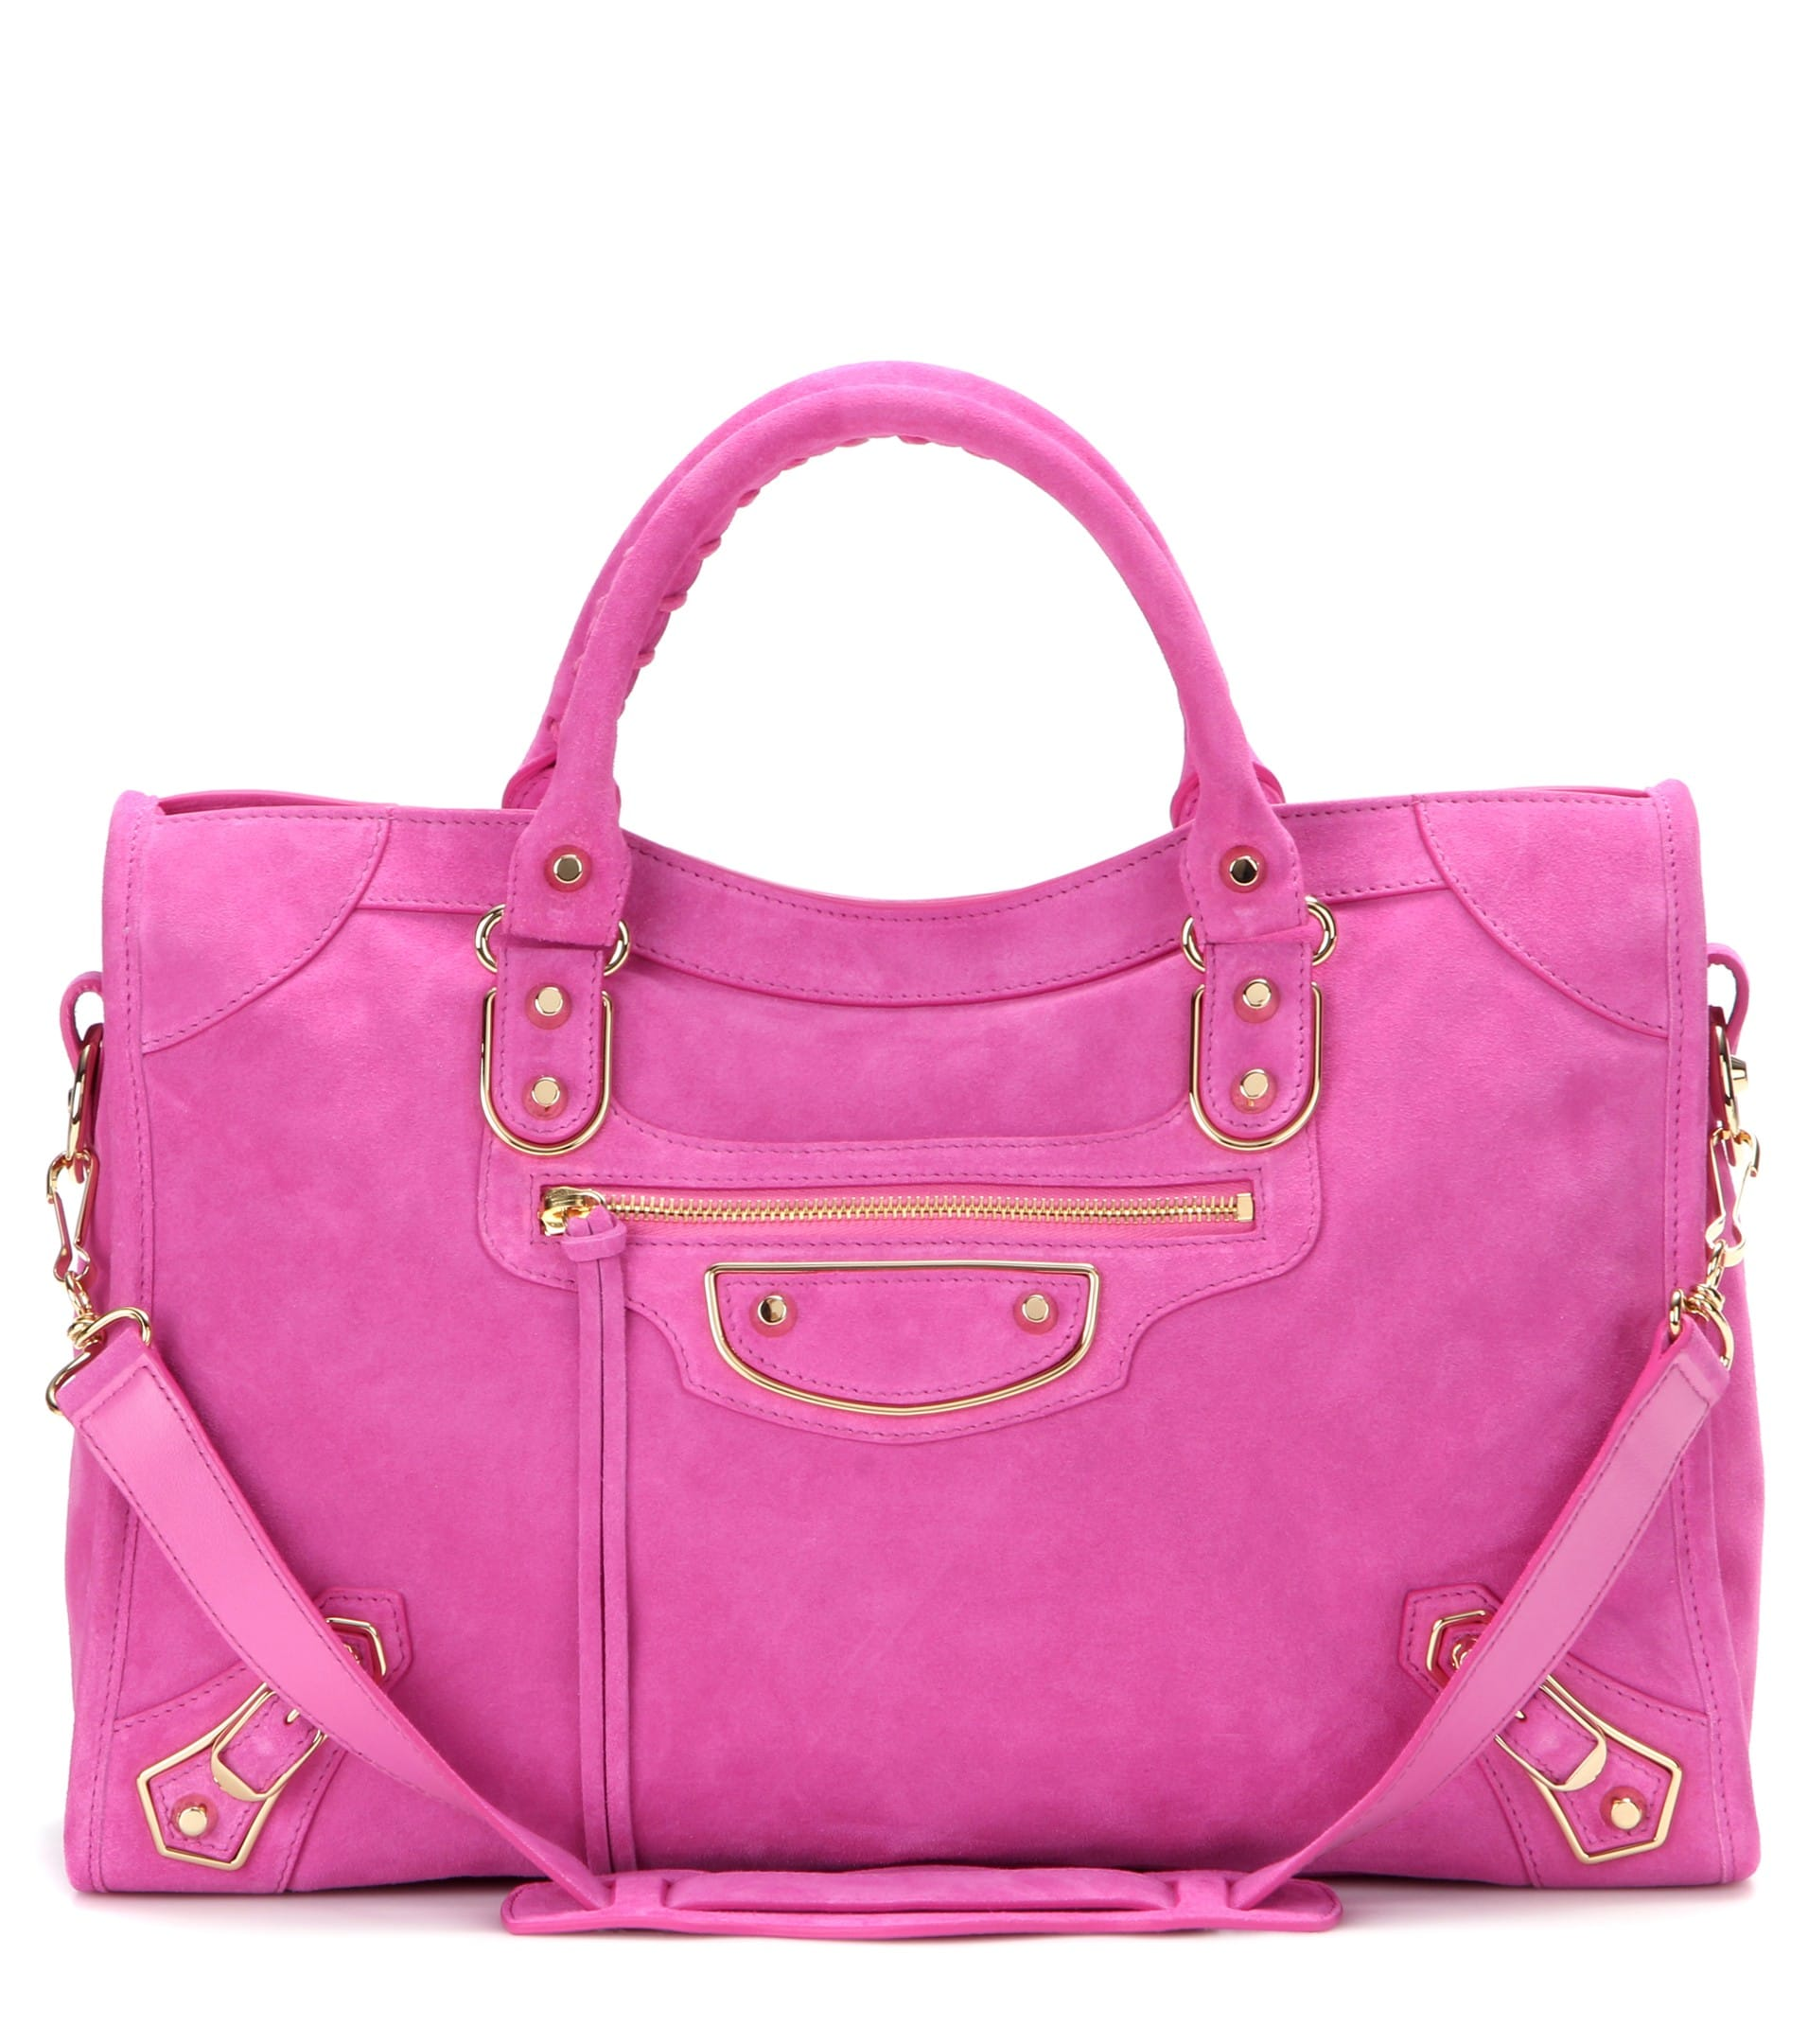 226cf559b94 Balenciaga Rose Bubble Gum Suede Classic Metallic Edge City Bag